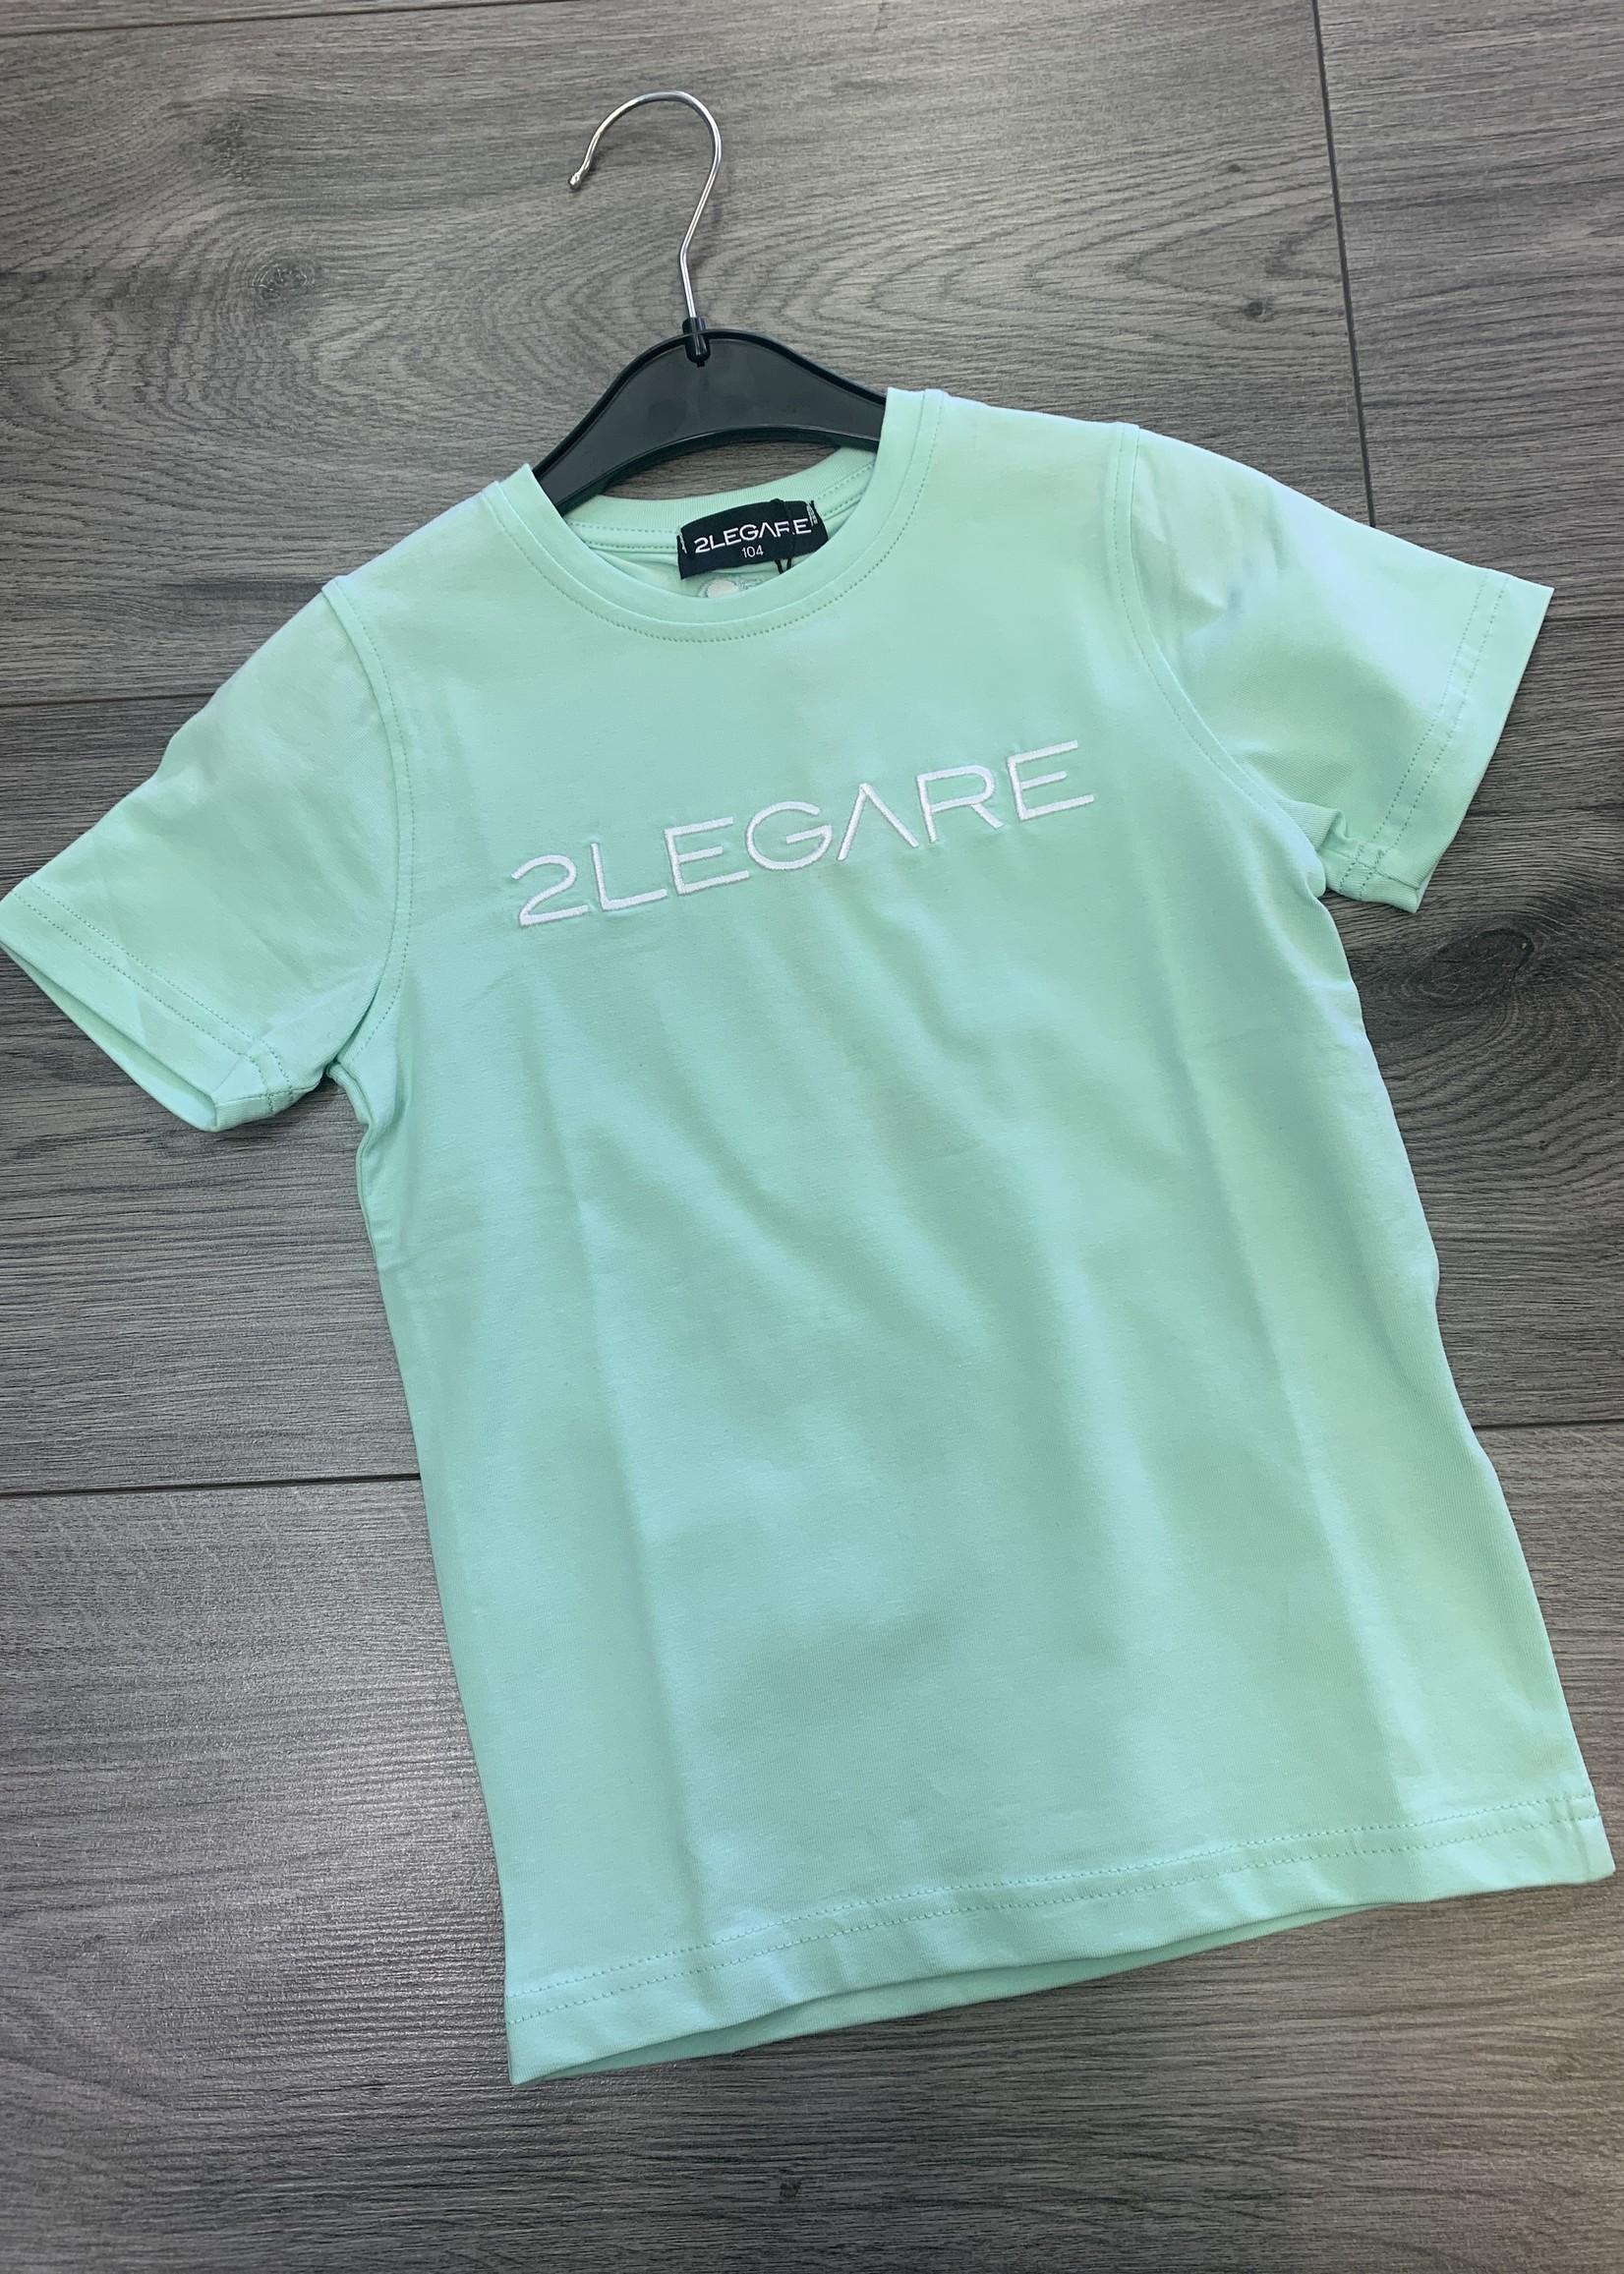 2LEGARE 2LEGARE Kids logo tee mint white